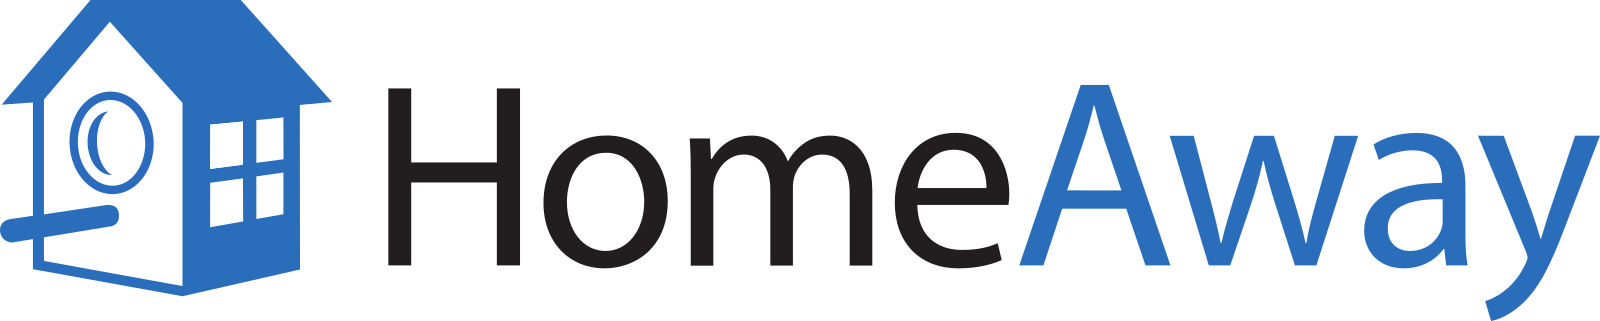 Homeaway logo.